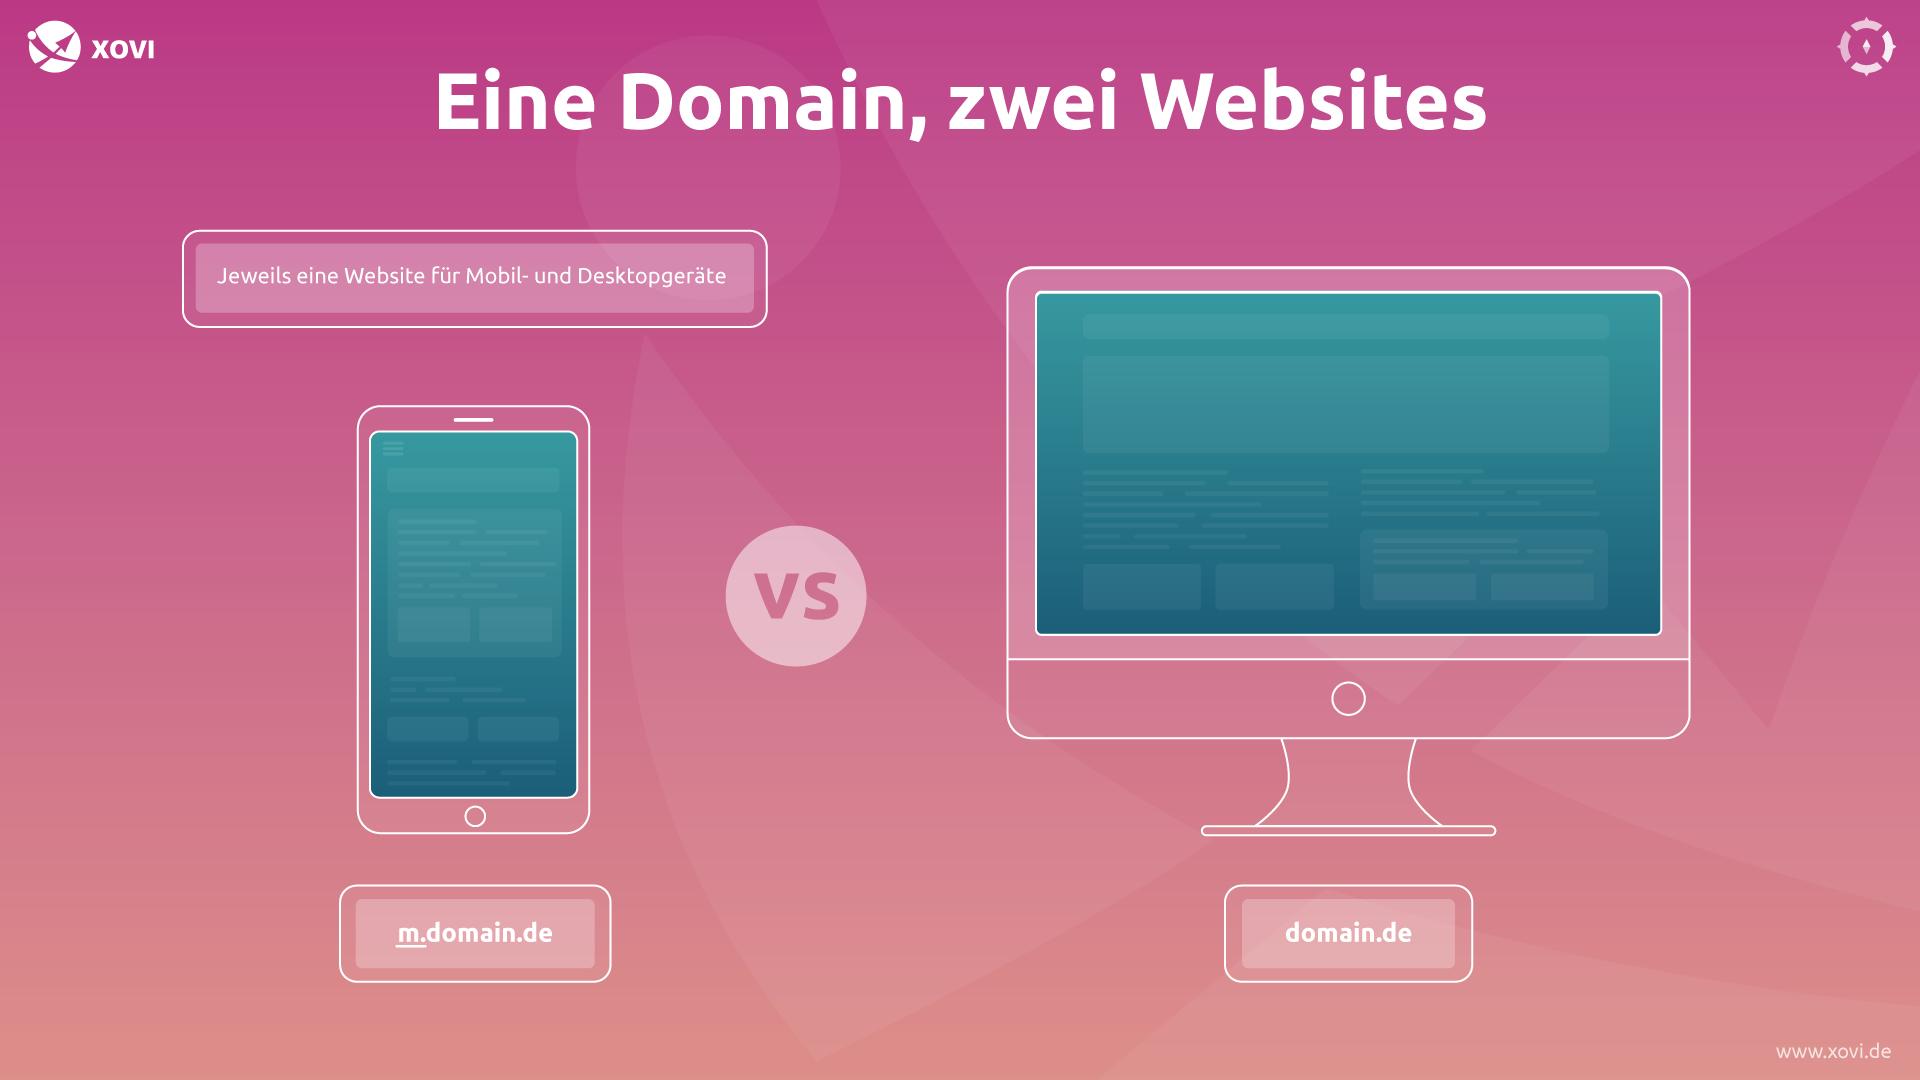 Infografik zwei Websites eine Domain